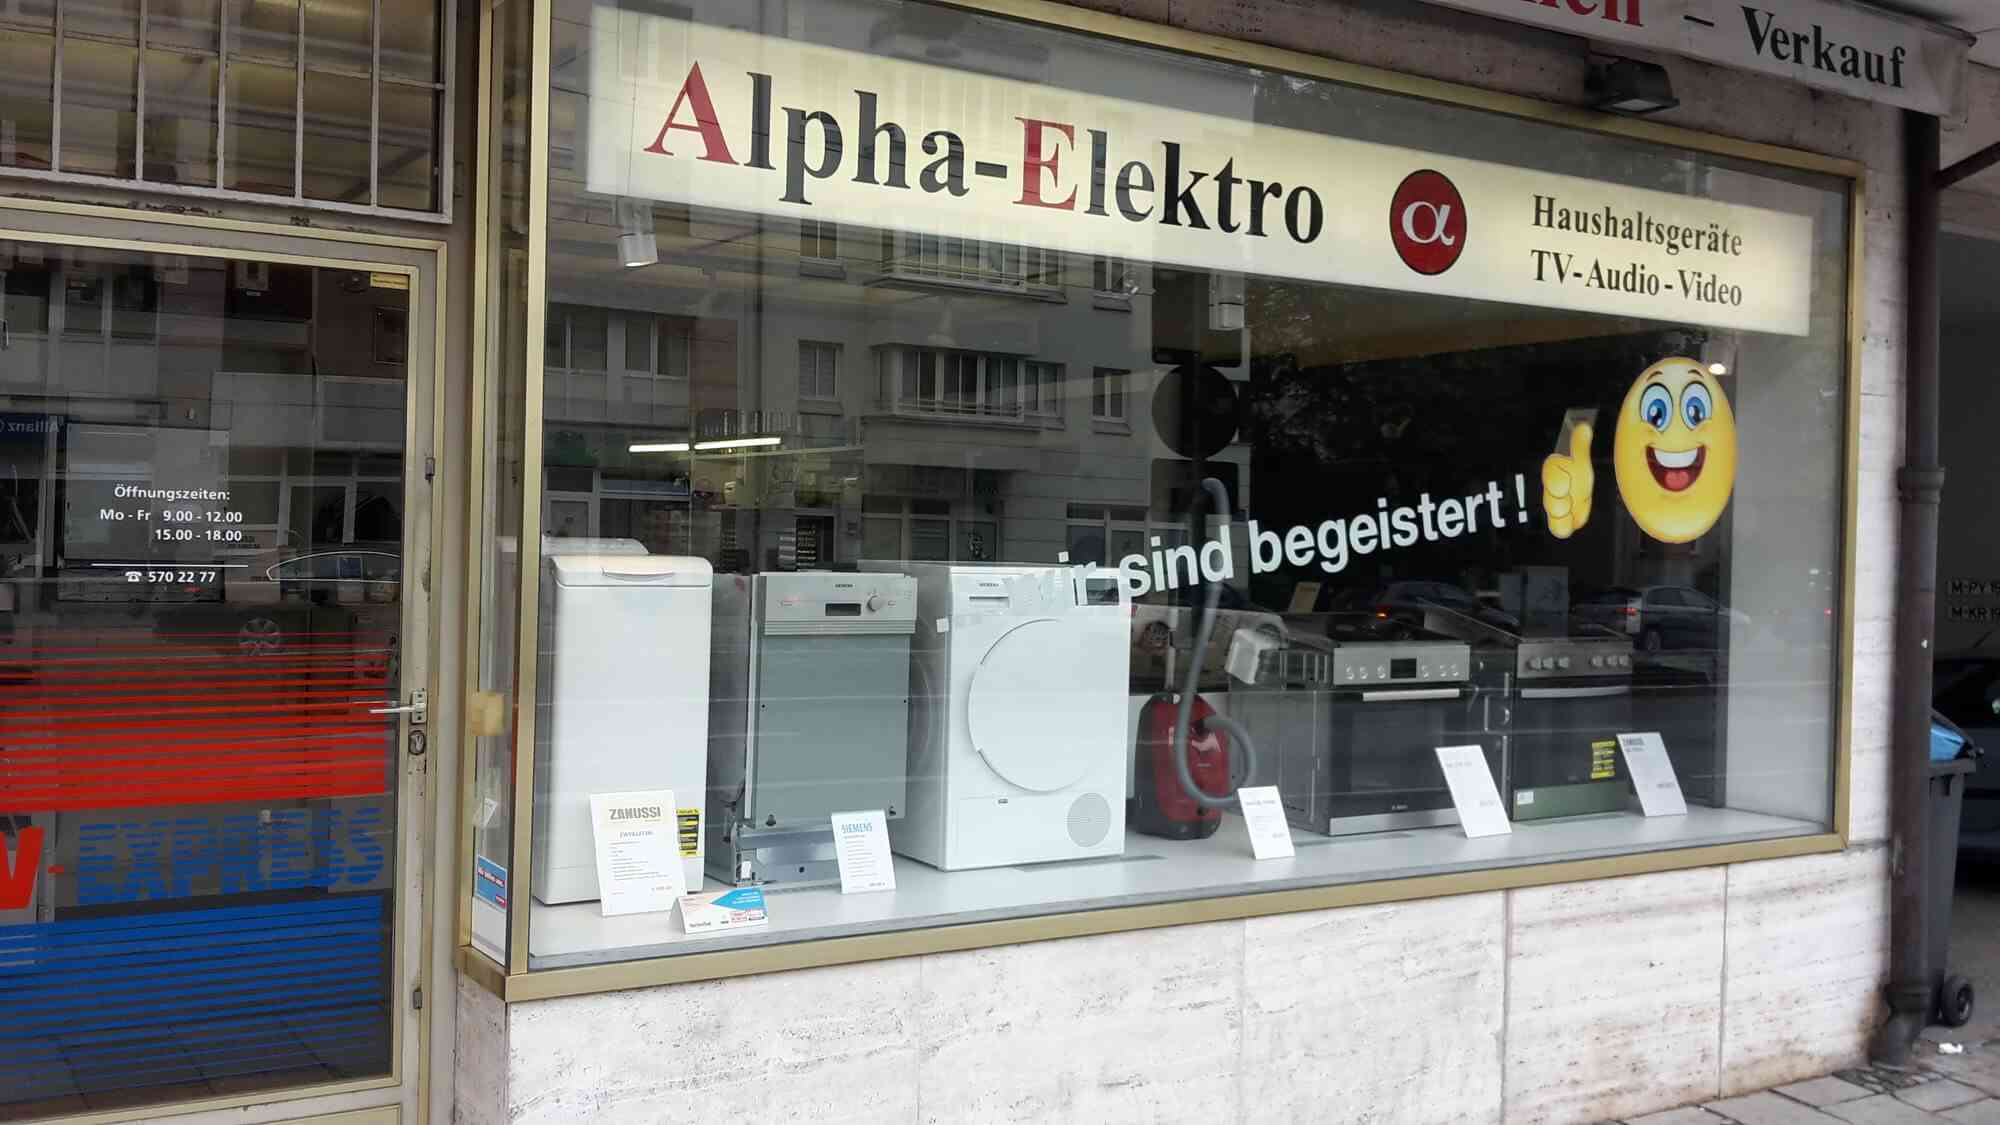 kaffeemaschinen reparatur m nchen alpha elektro charris xomplios. Black Bedroom Furniture Sets. Home Design Ideas